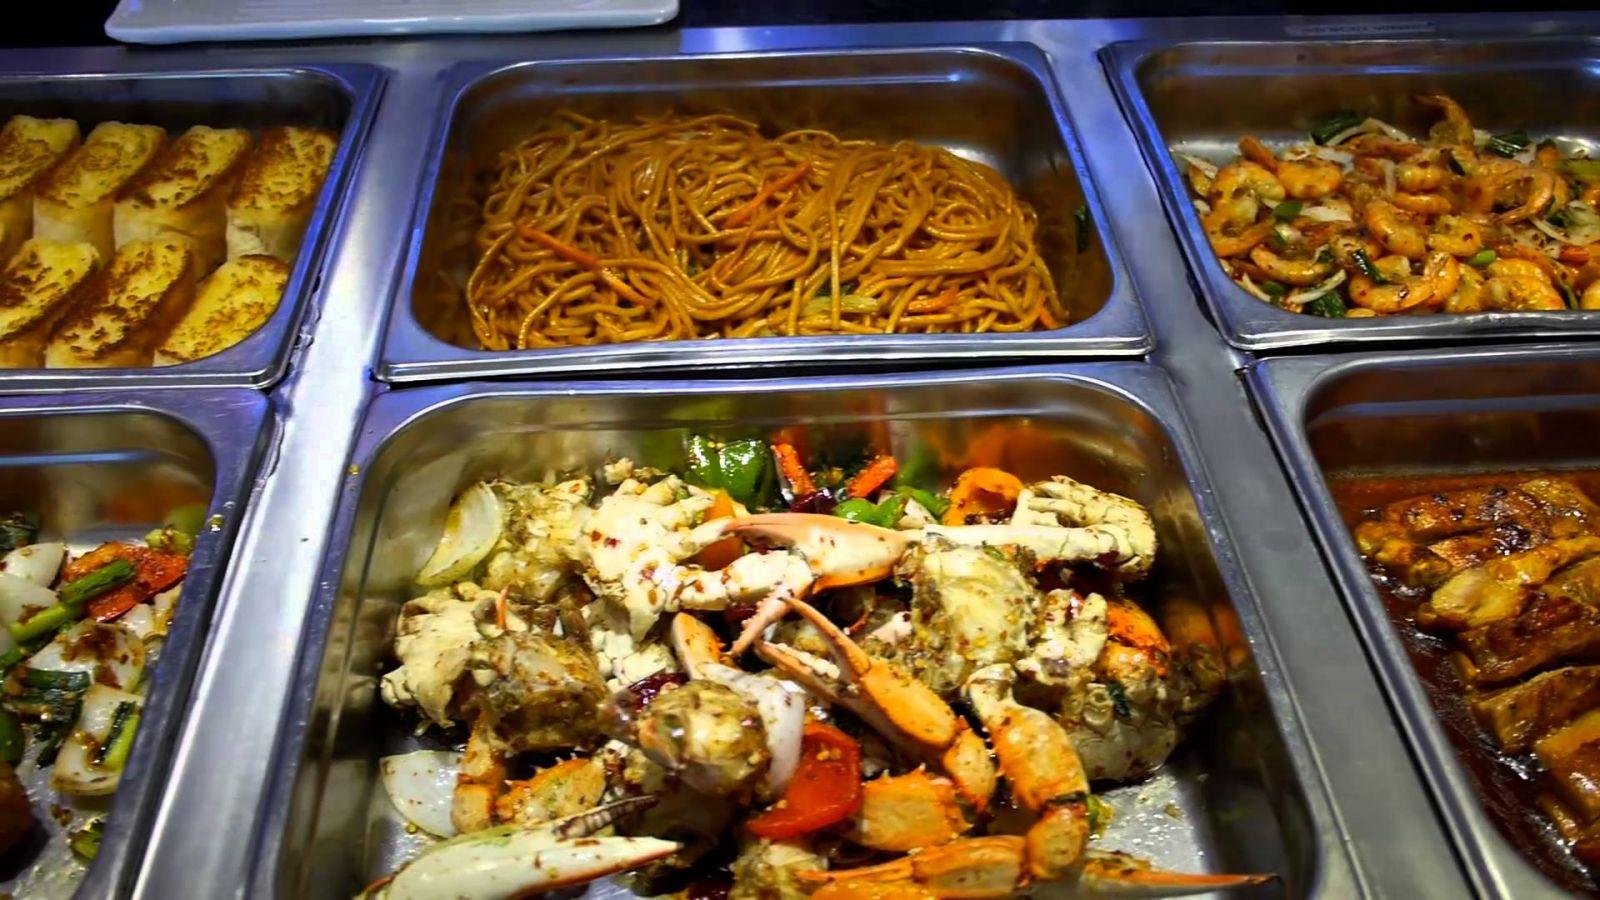 Ten Chinese Restaurants In Quintana Roo Shut Down For